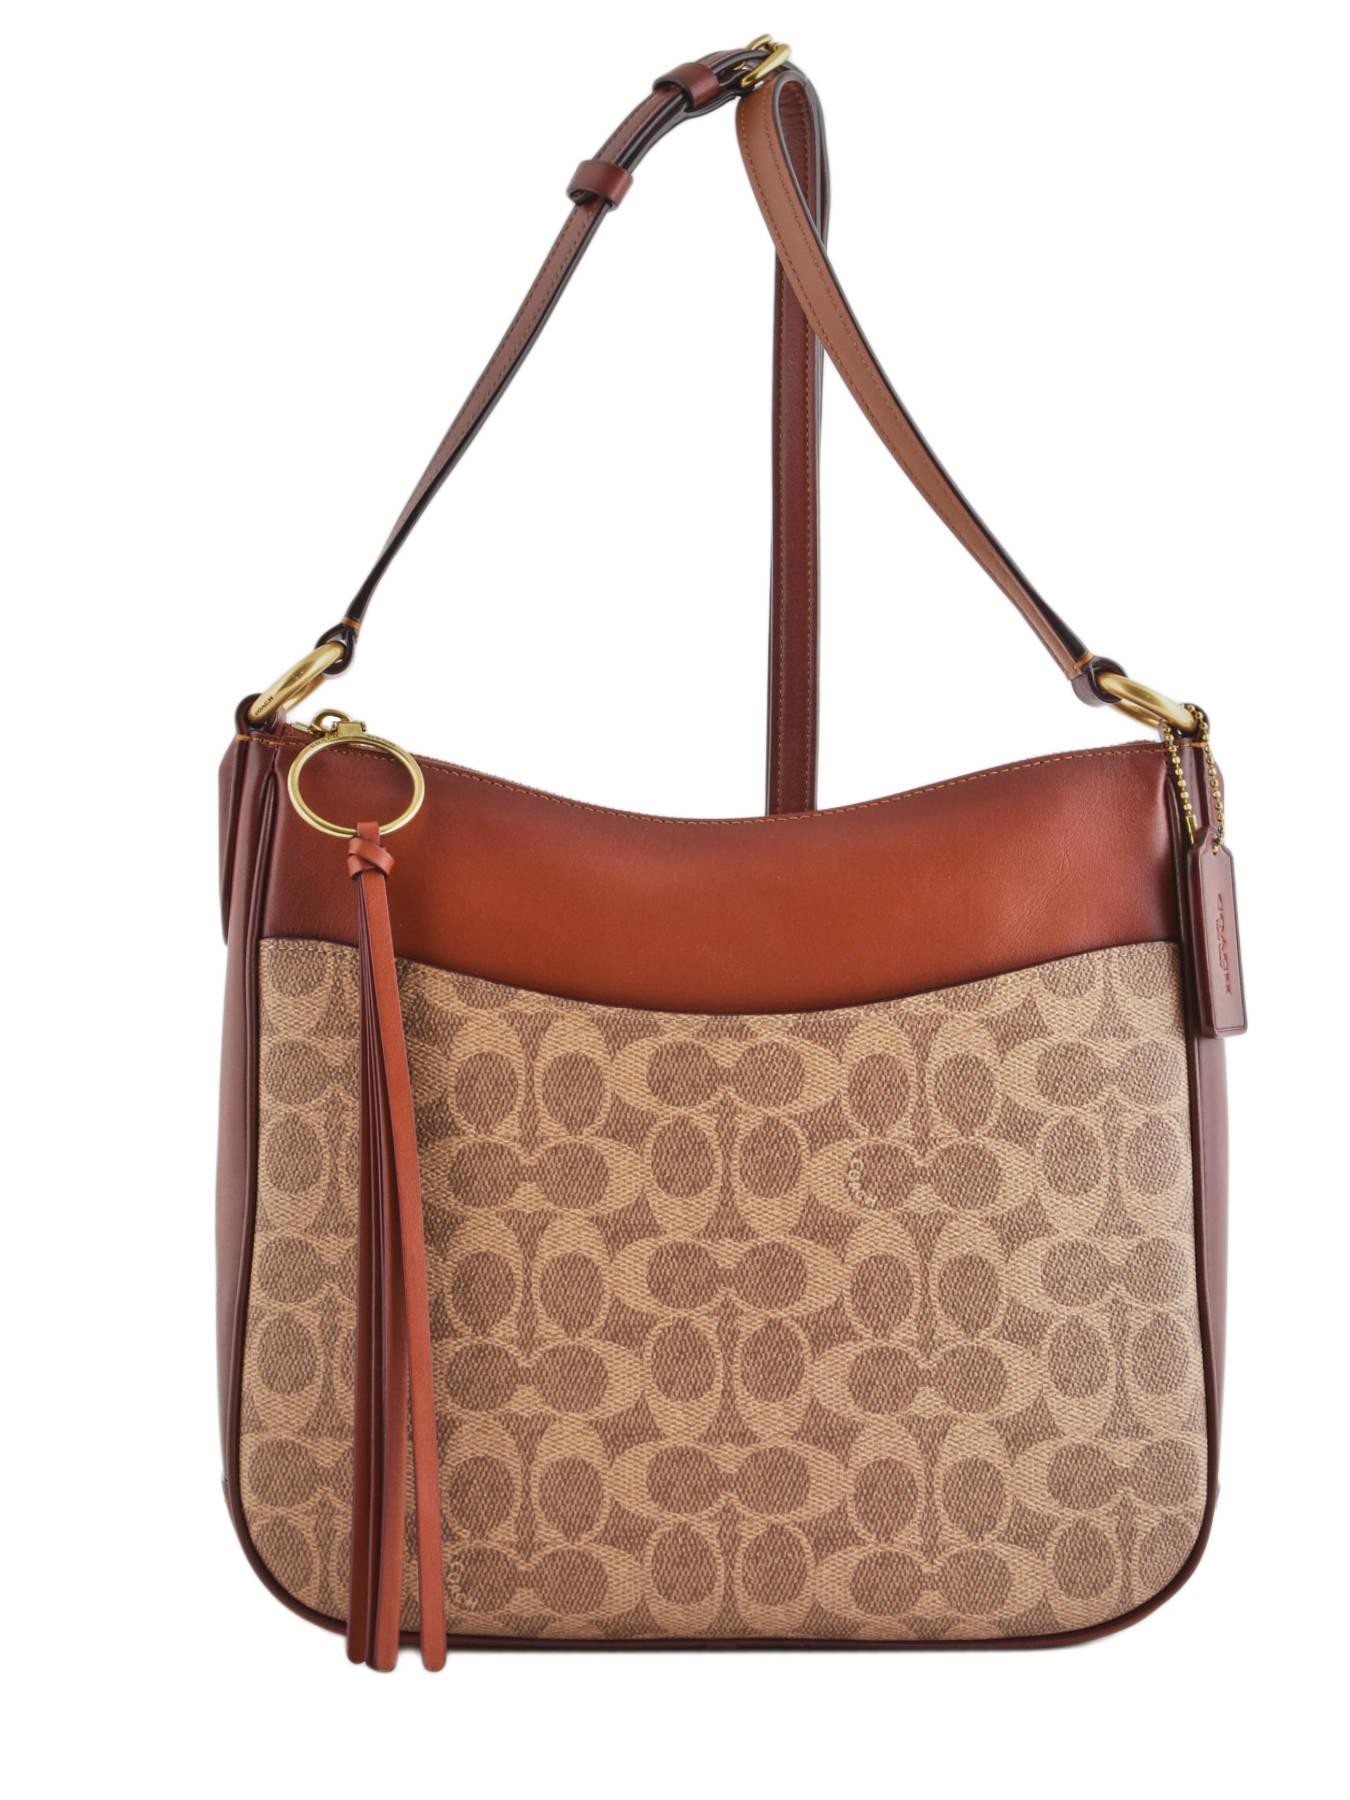 883570f5d9 ... Chaise Signature Crossbody Bag Coach Brown chaise 38579 ...